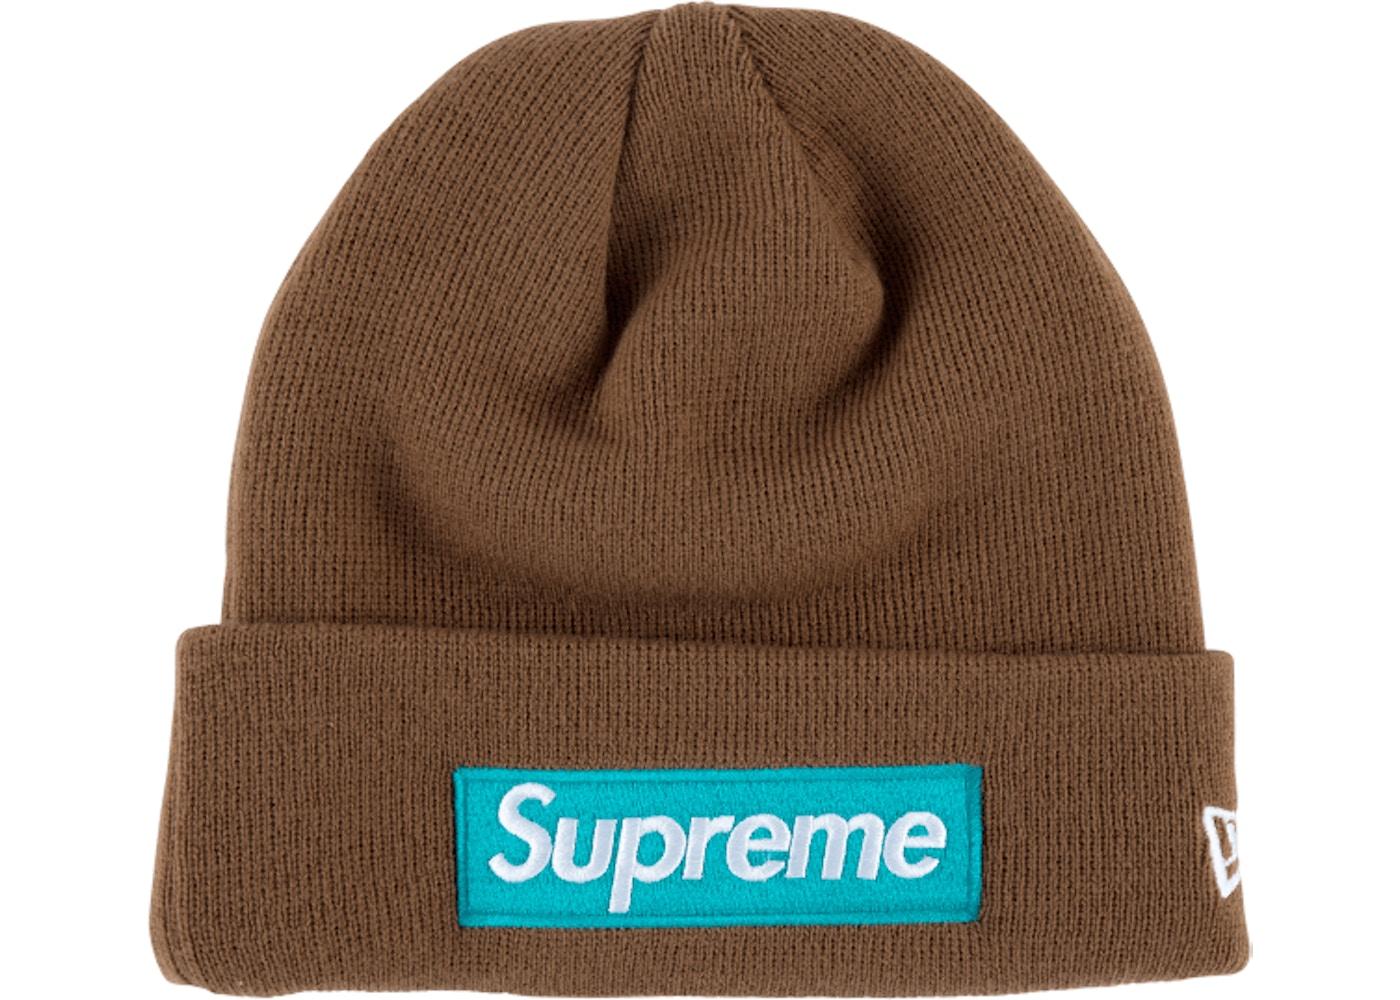 dfbd17f20d0 Streetwear - Supreme Headwear - Price Premium